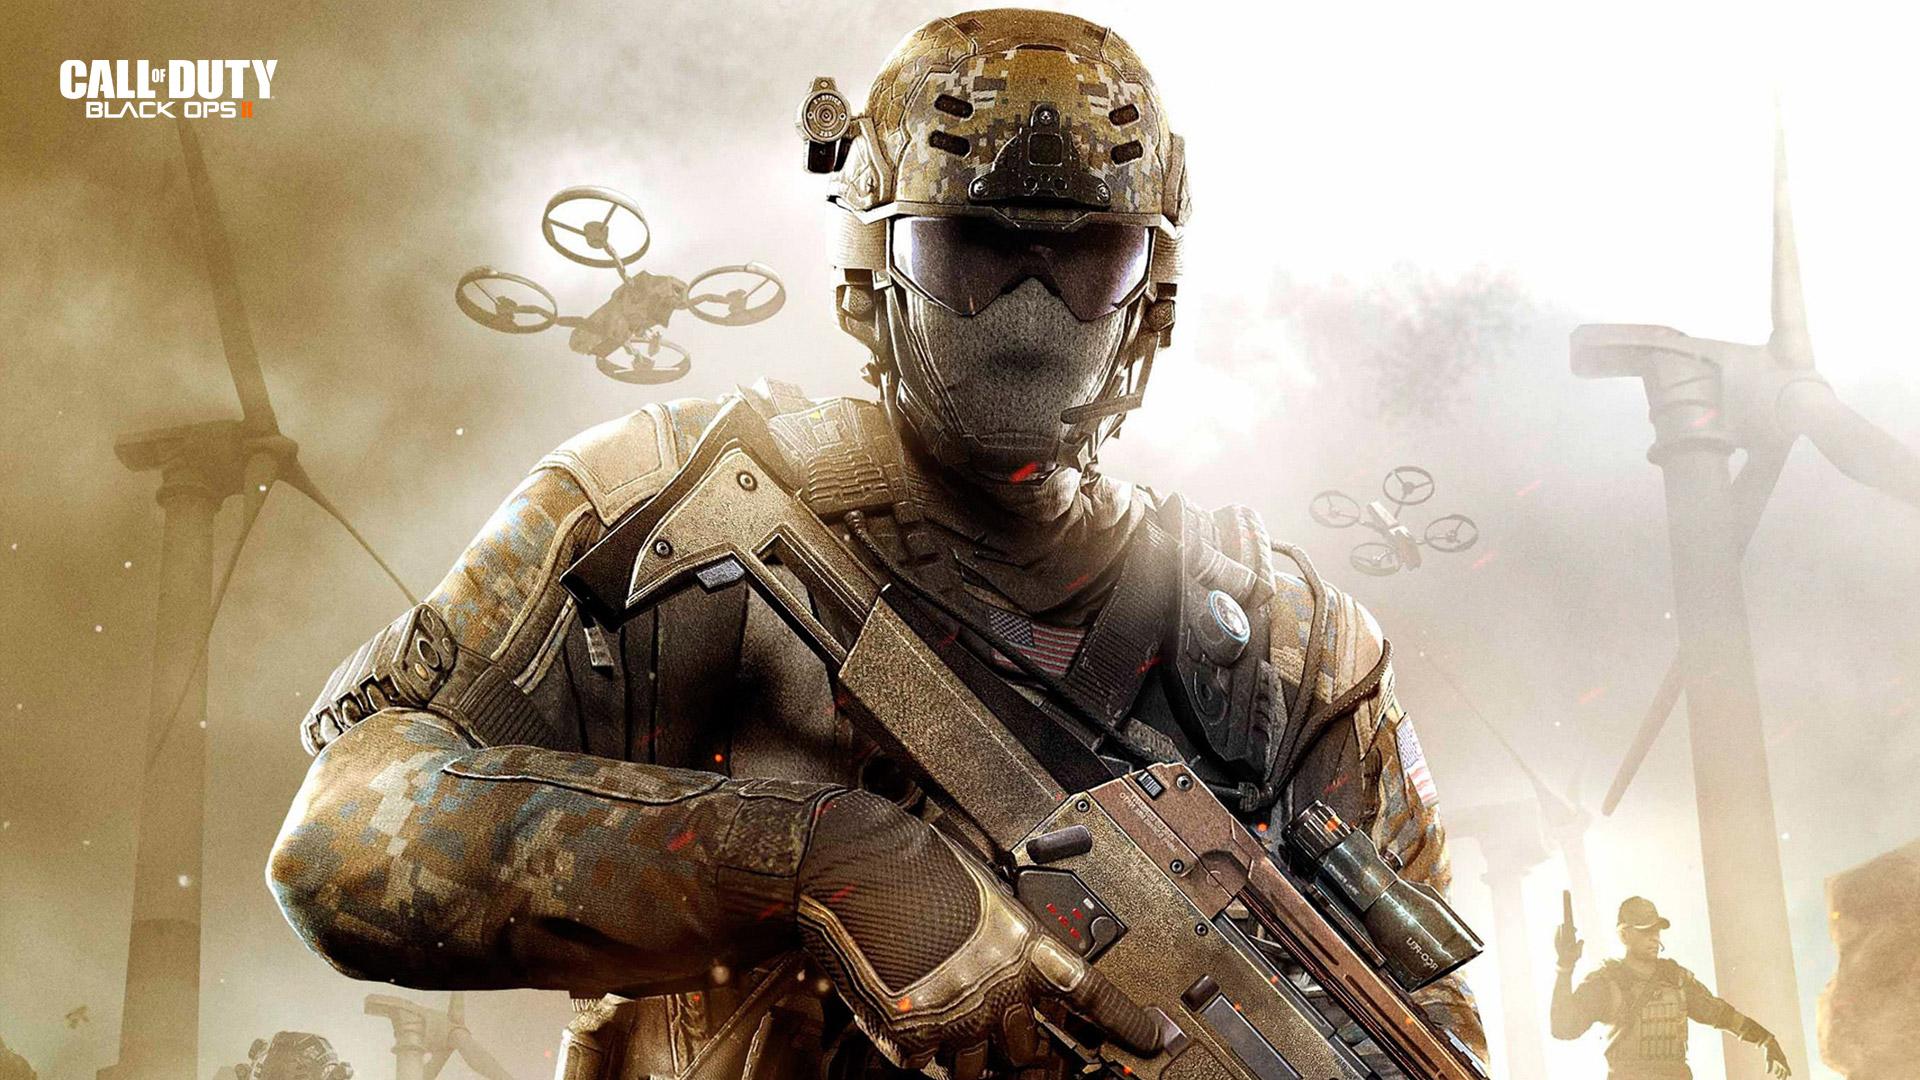 Call Duty Black Ops Ii Pic Free Download By Celina Leeburn